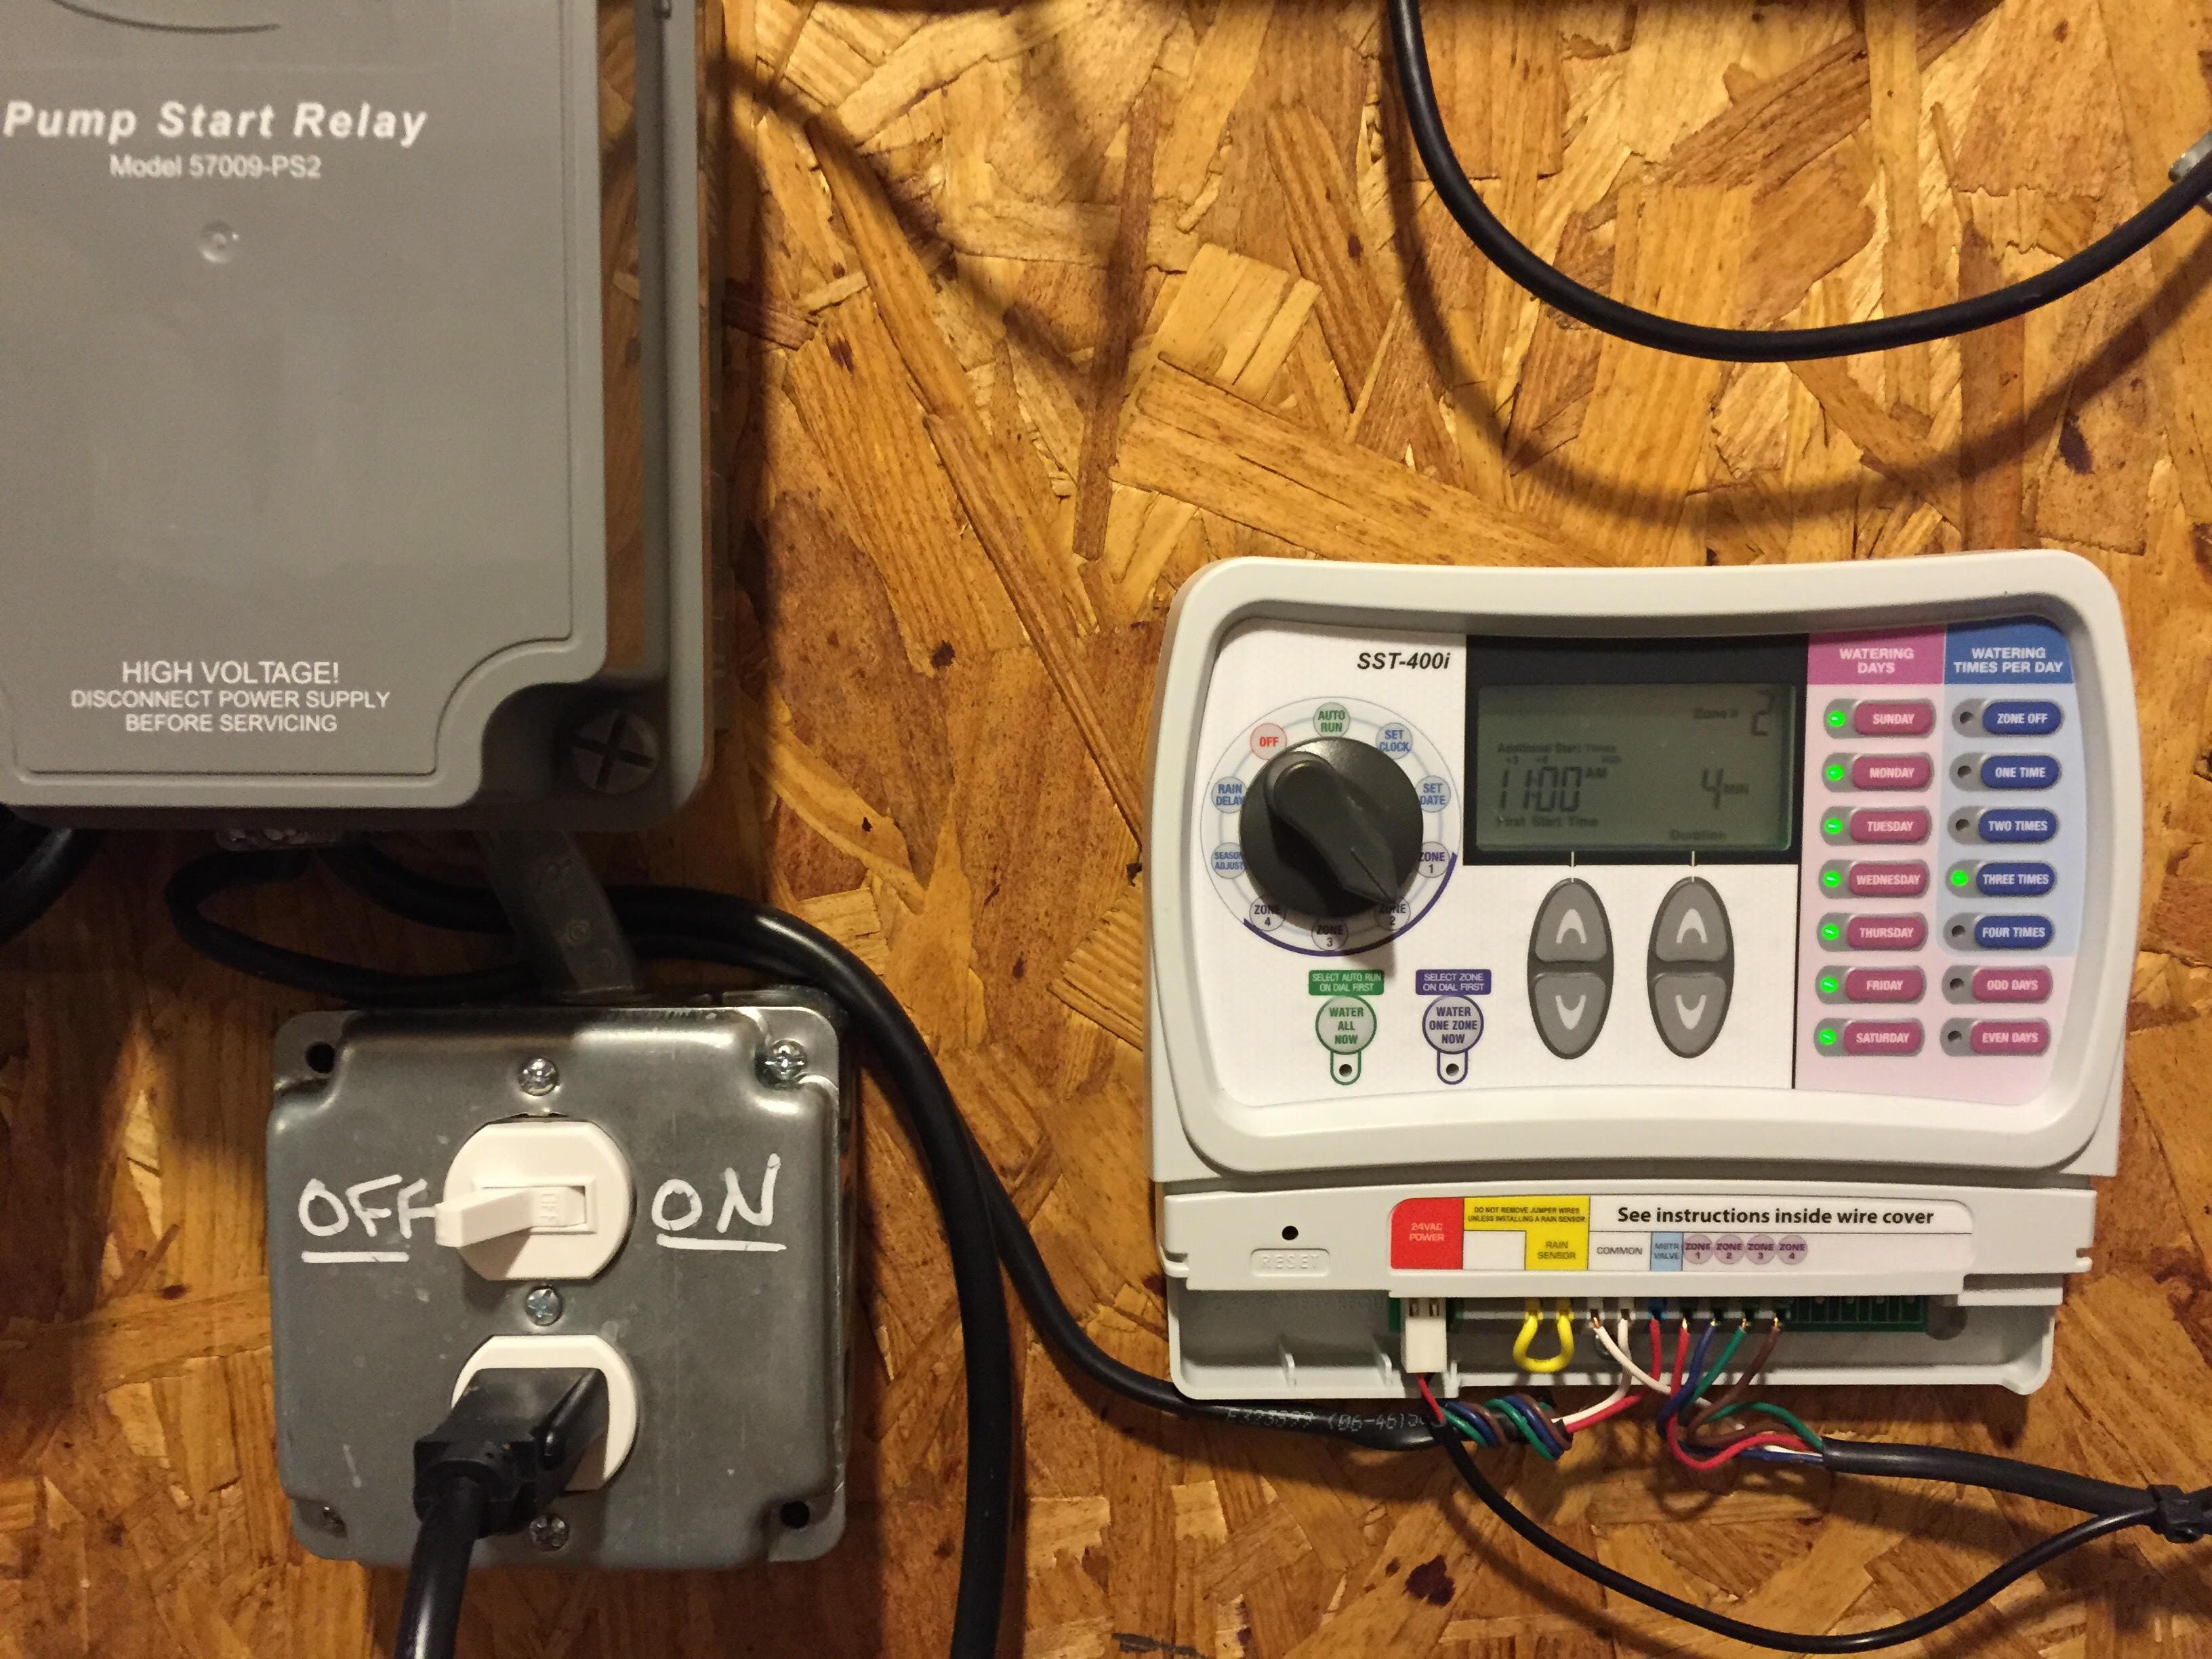 Orbit Pump Start Relay Instructions topic Opensprinkler Pump Start Relay Wiring Question Of Orbit Pump Start Relay Instructions